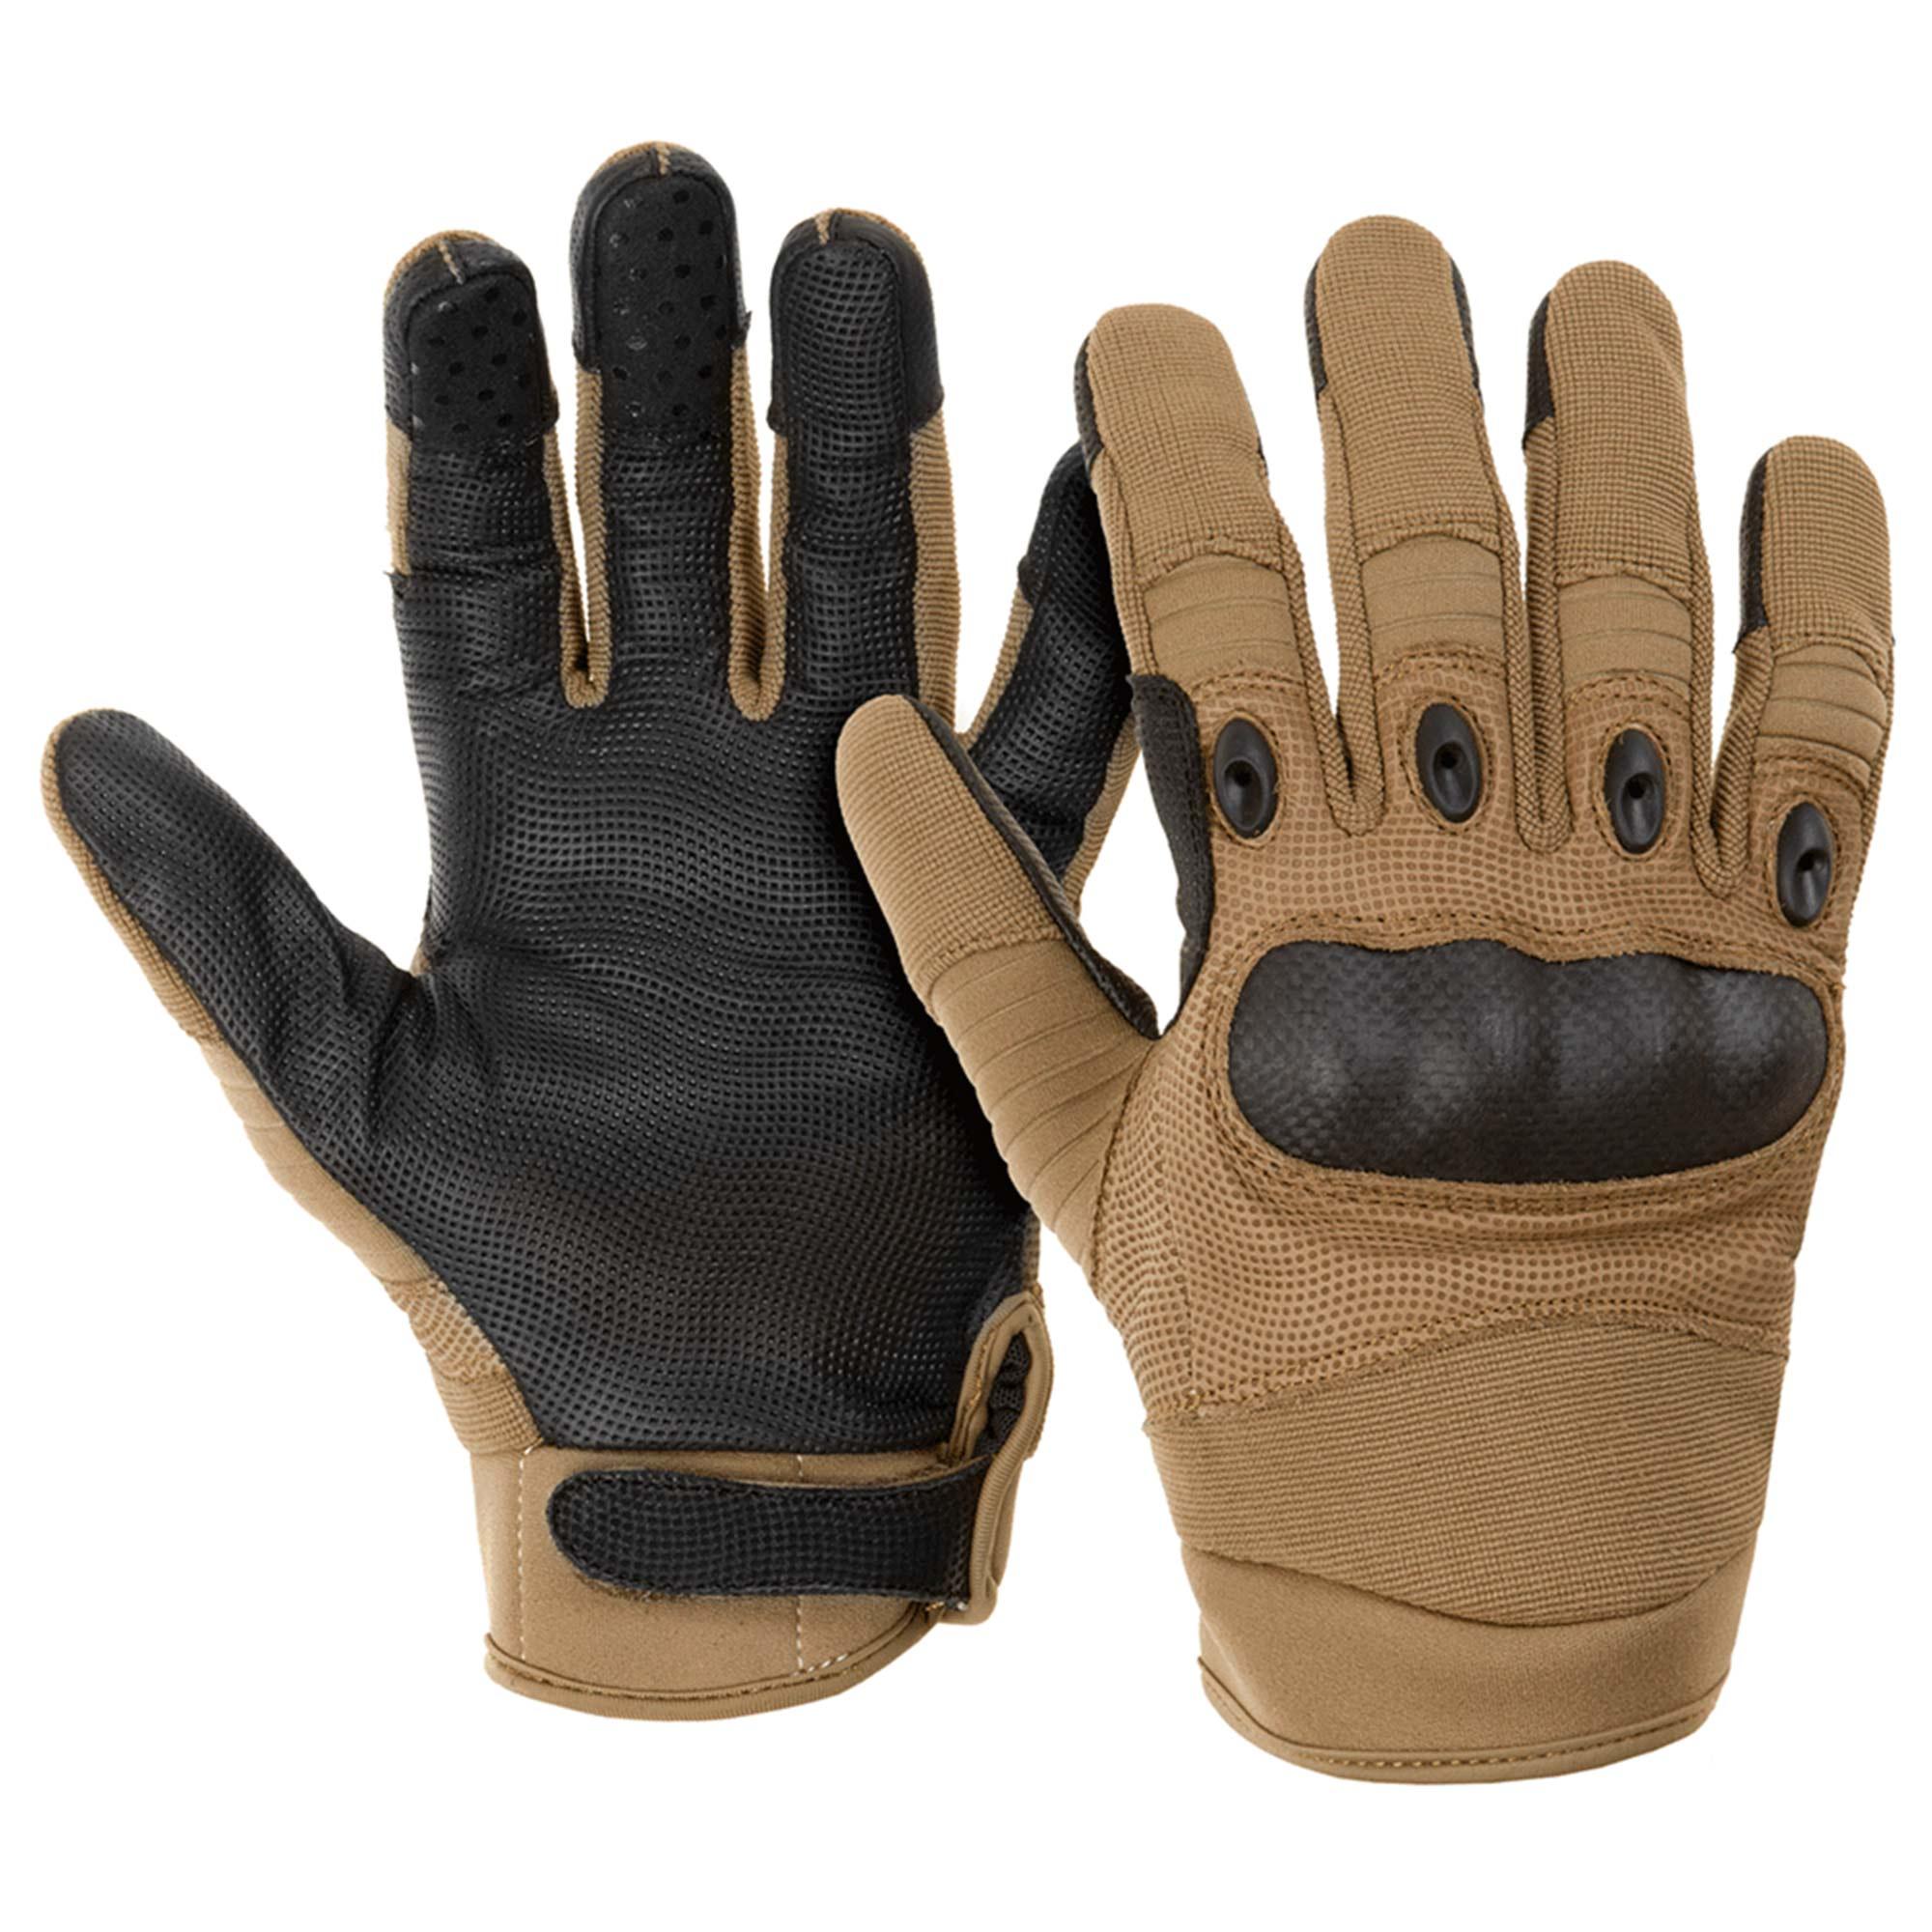 Invader Gear Handschuhe Assault Gloves coyote